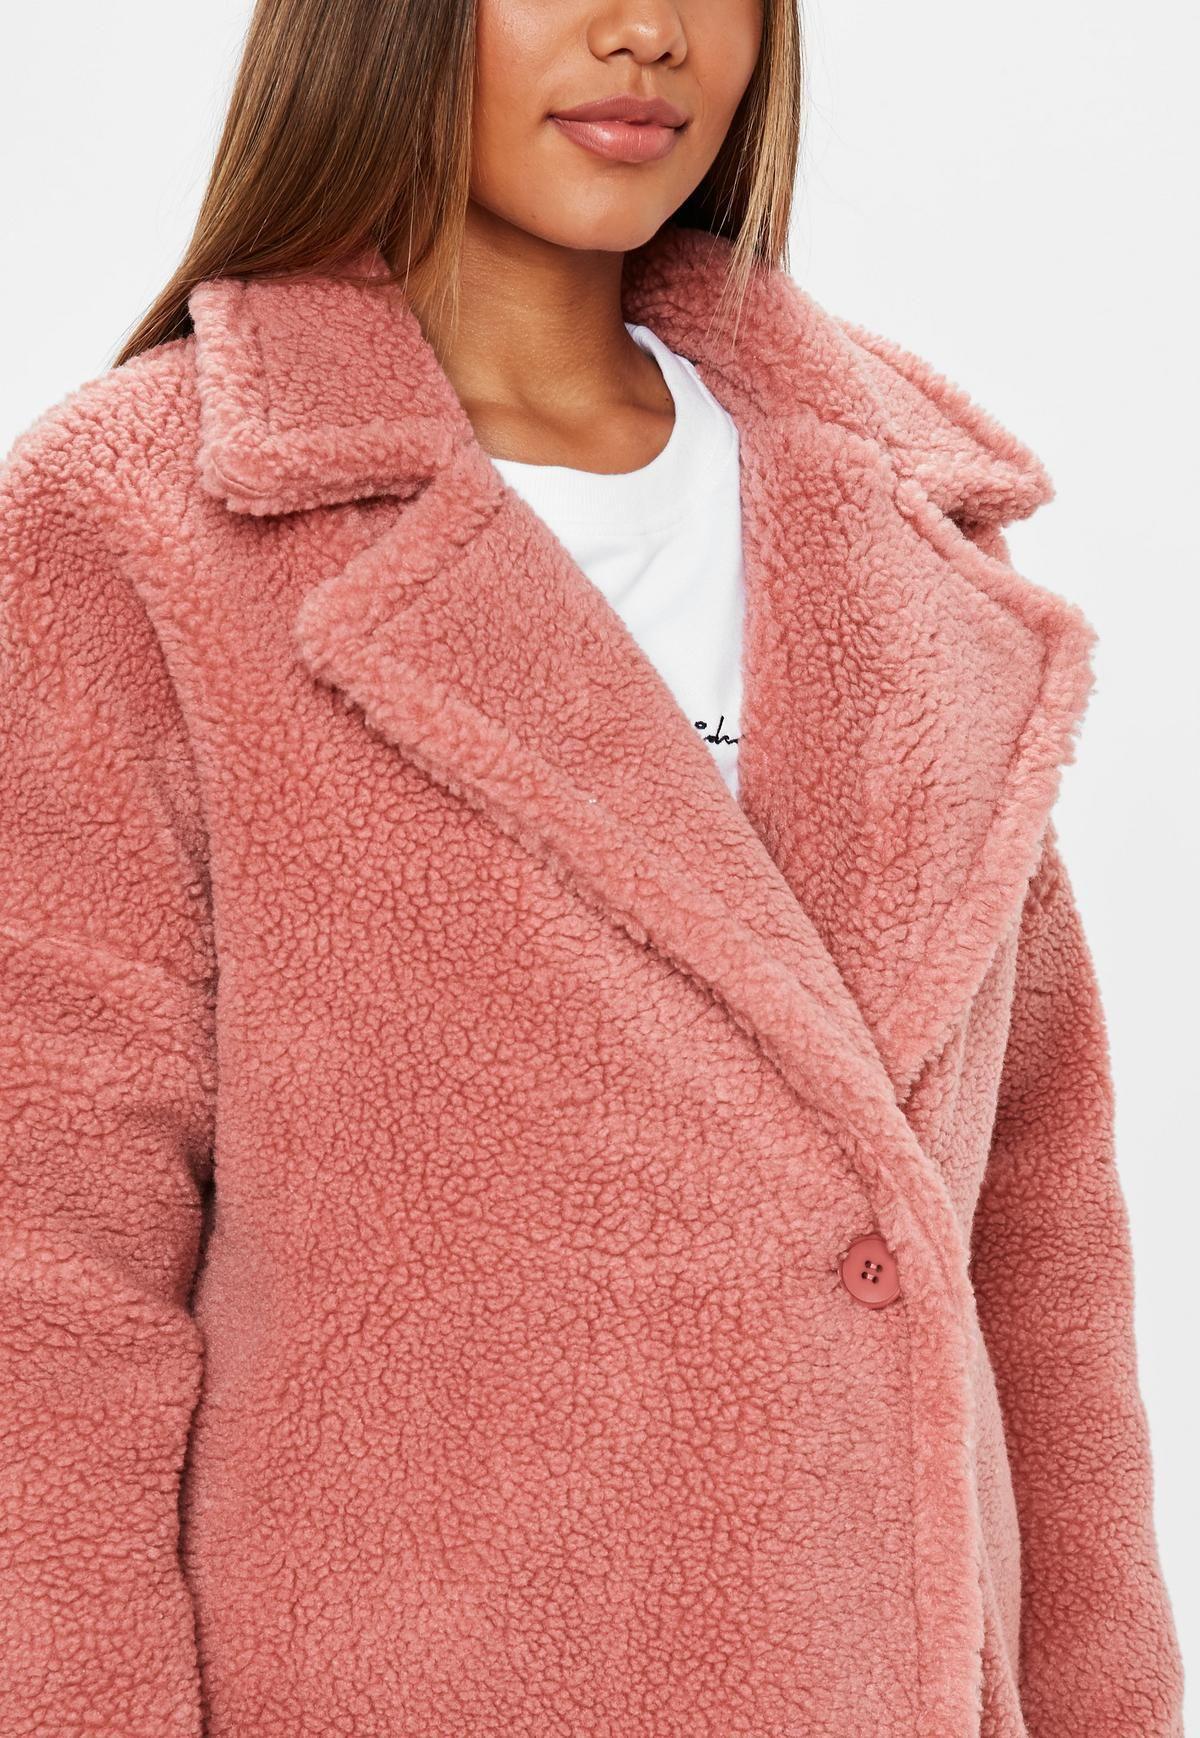 Blush Pink Chunky Borg Teddy Coat Missguided Women S Coats Jackets Clothes Coats Jackets [ 1738 x 1200 Pixel ]